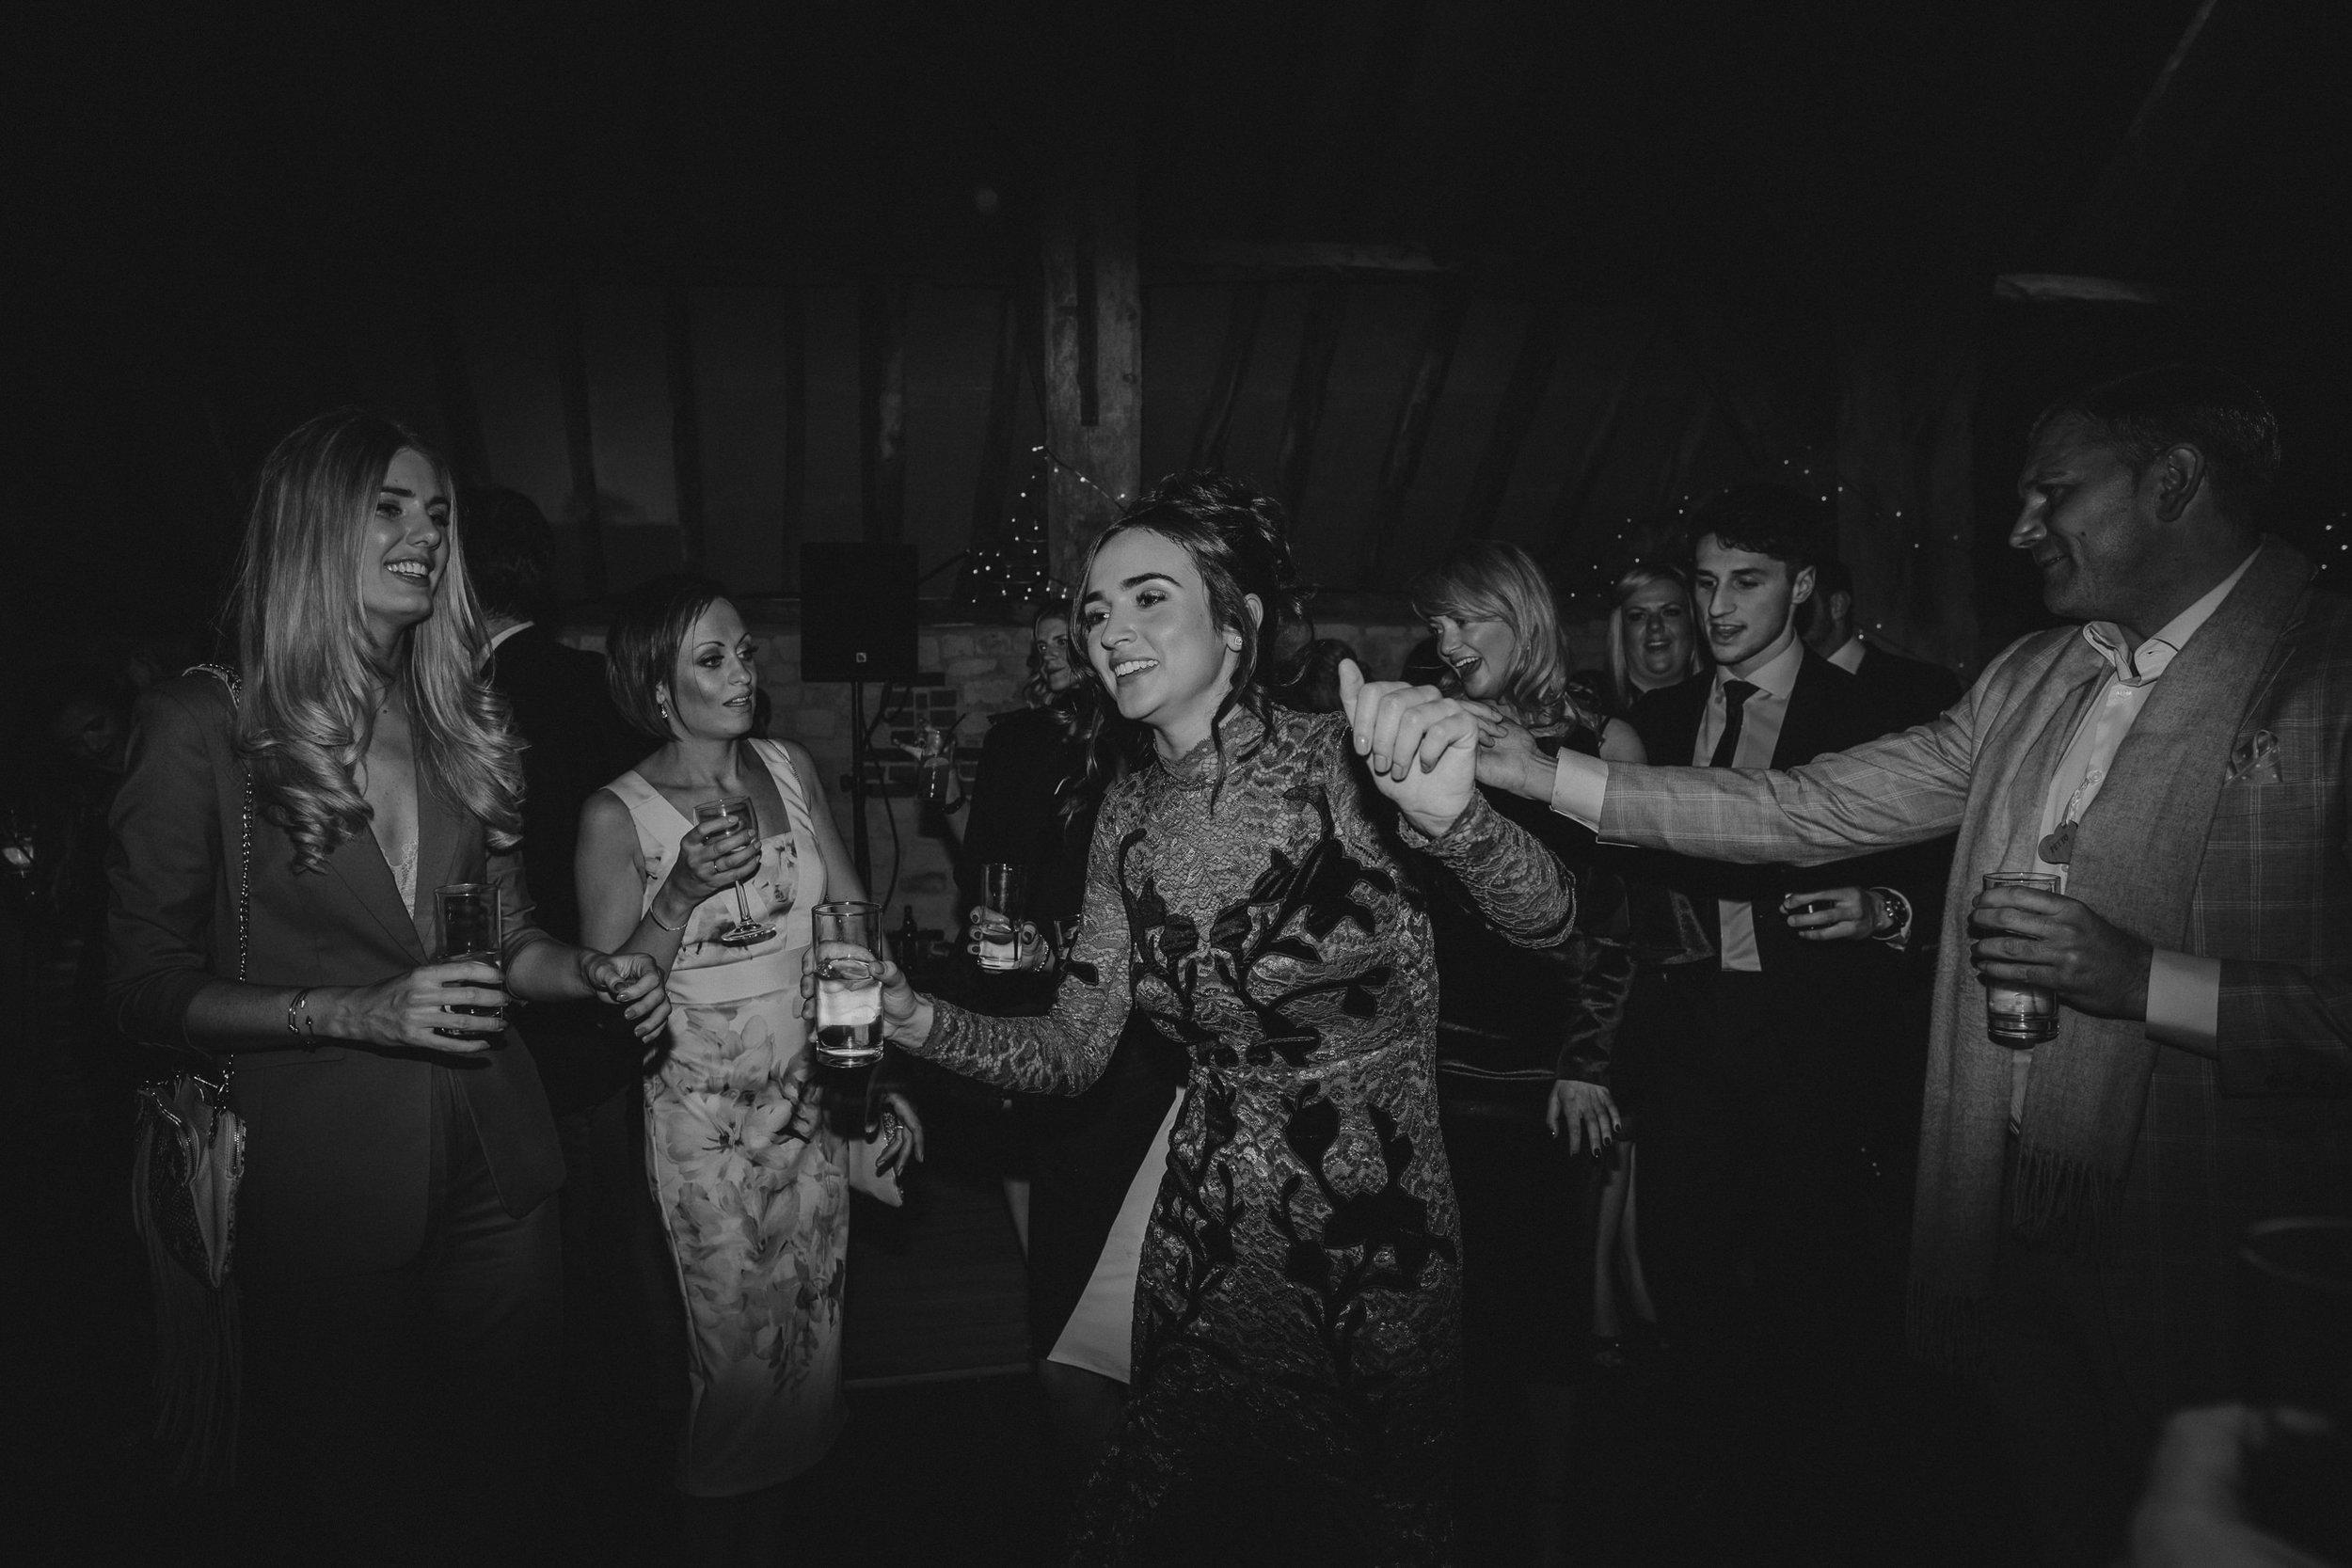 Jenny Packham dress Bury Court Barn Hampshire Wedding Photographer Gione da Silva_045.jpg